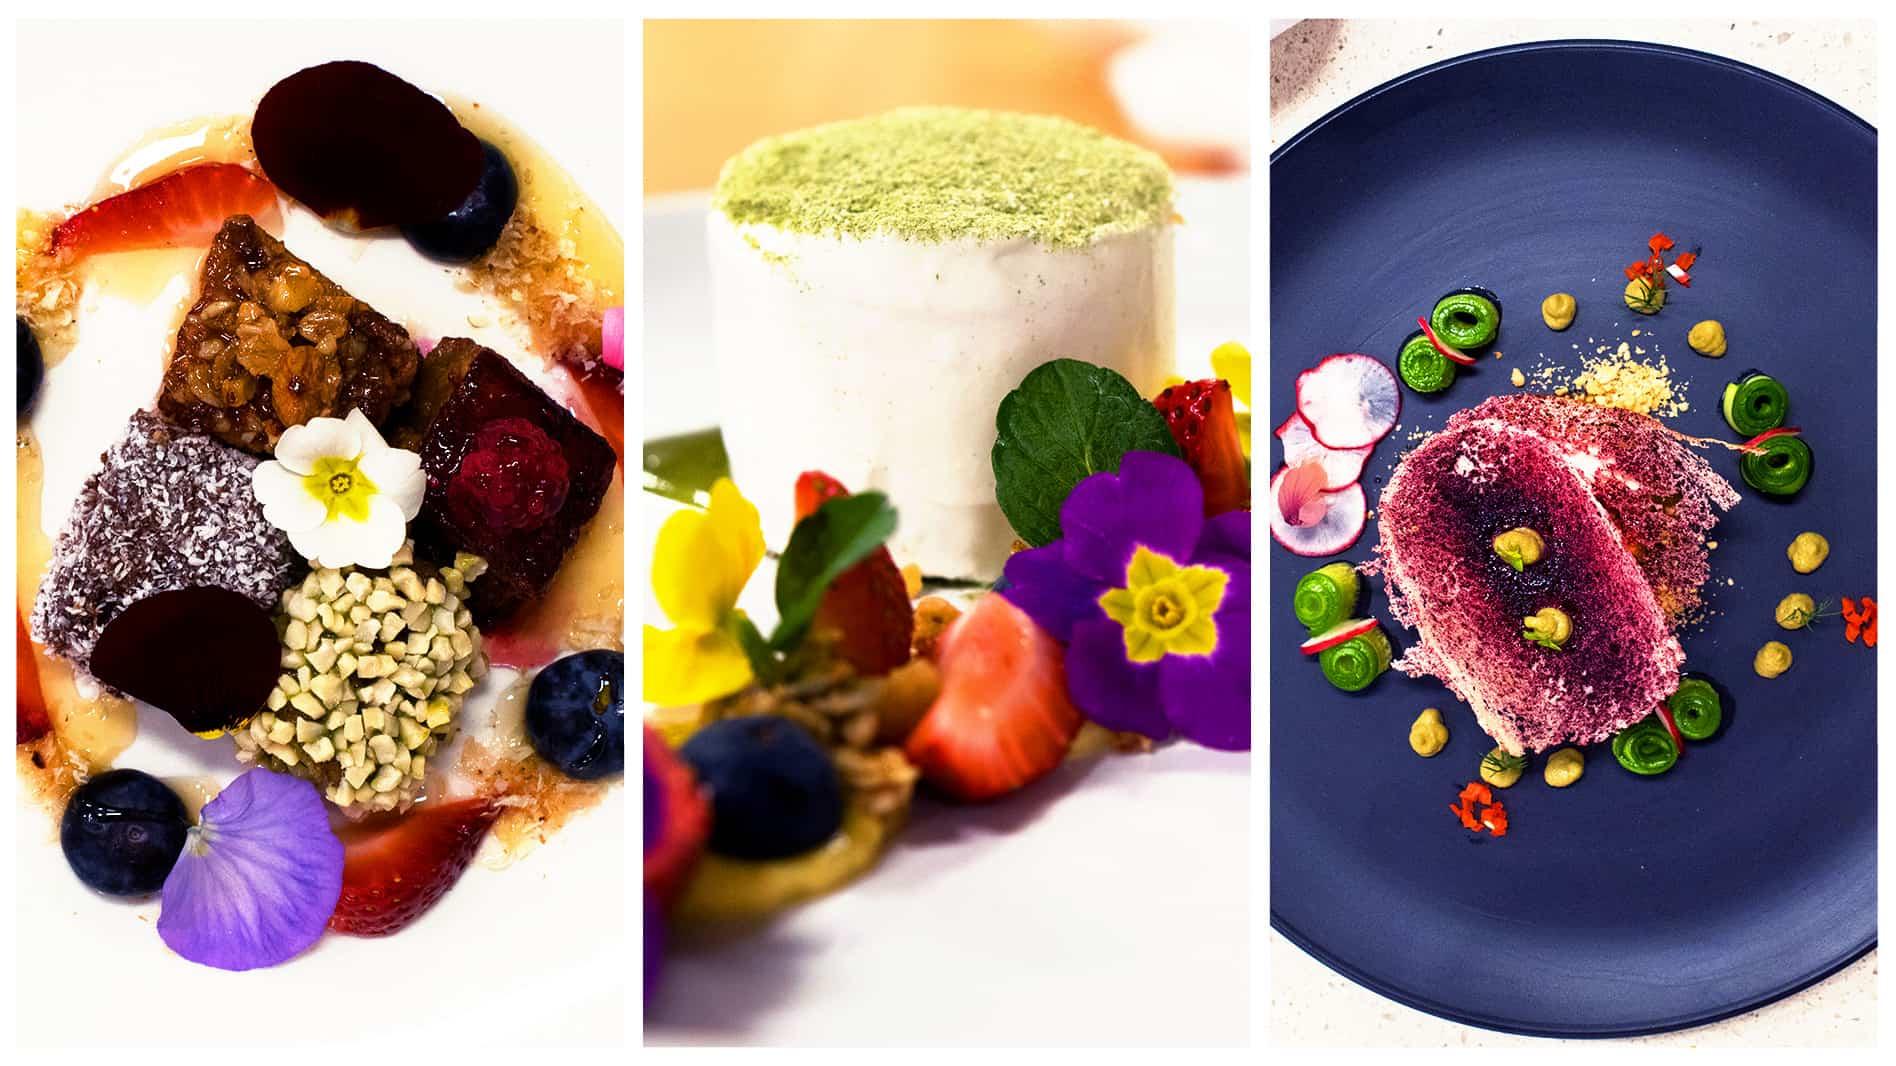 Chefology - step up to the plate